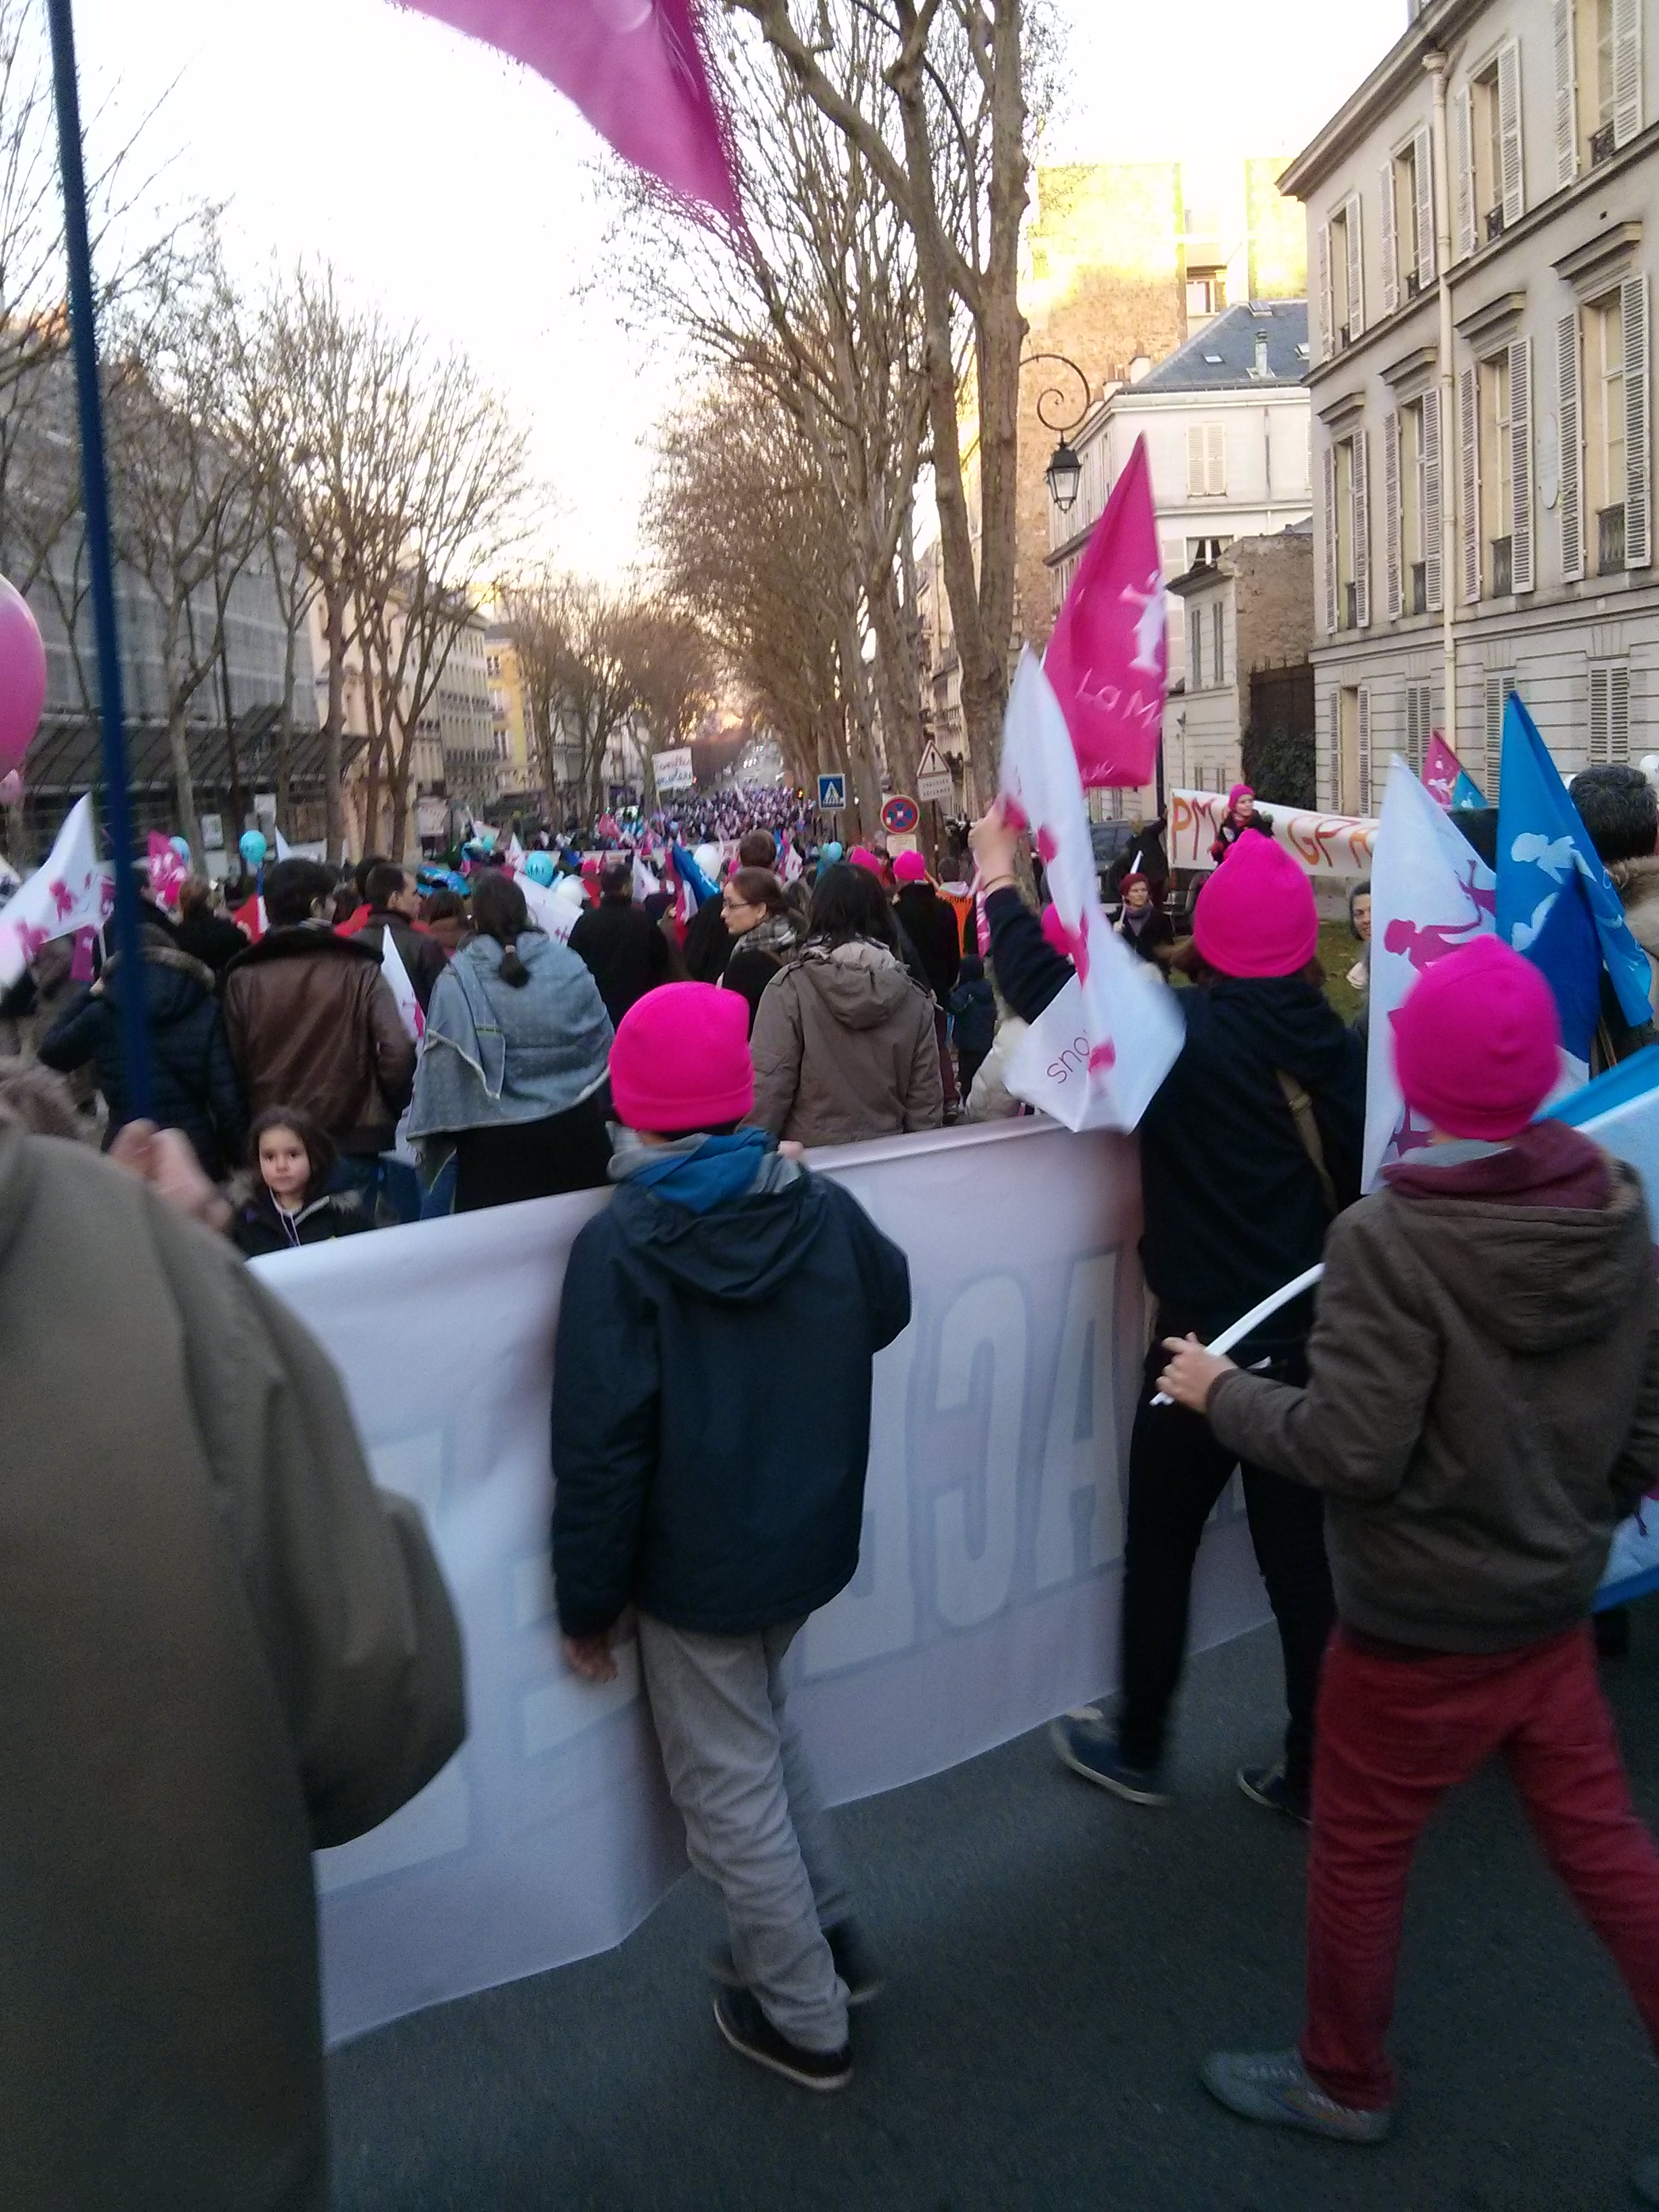 la foule en marche